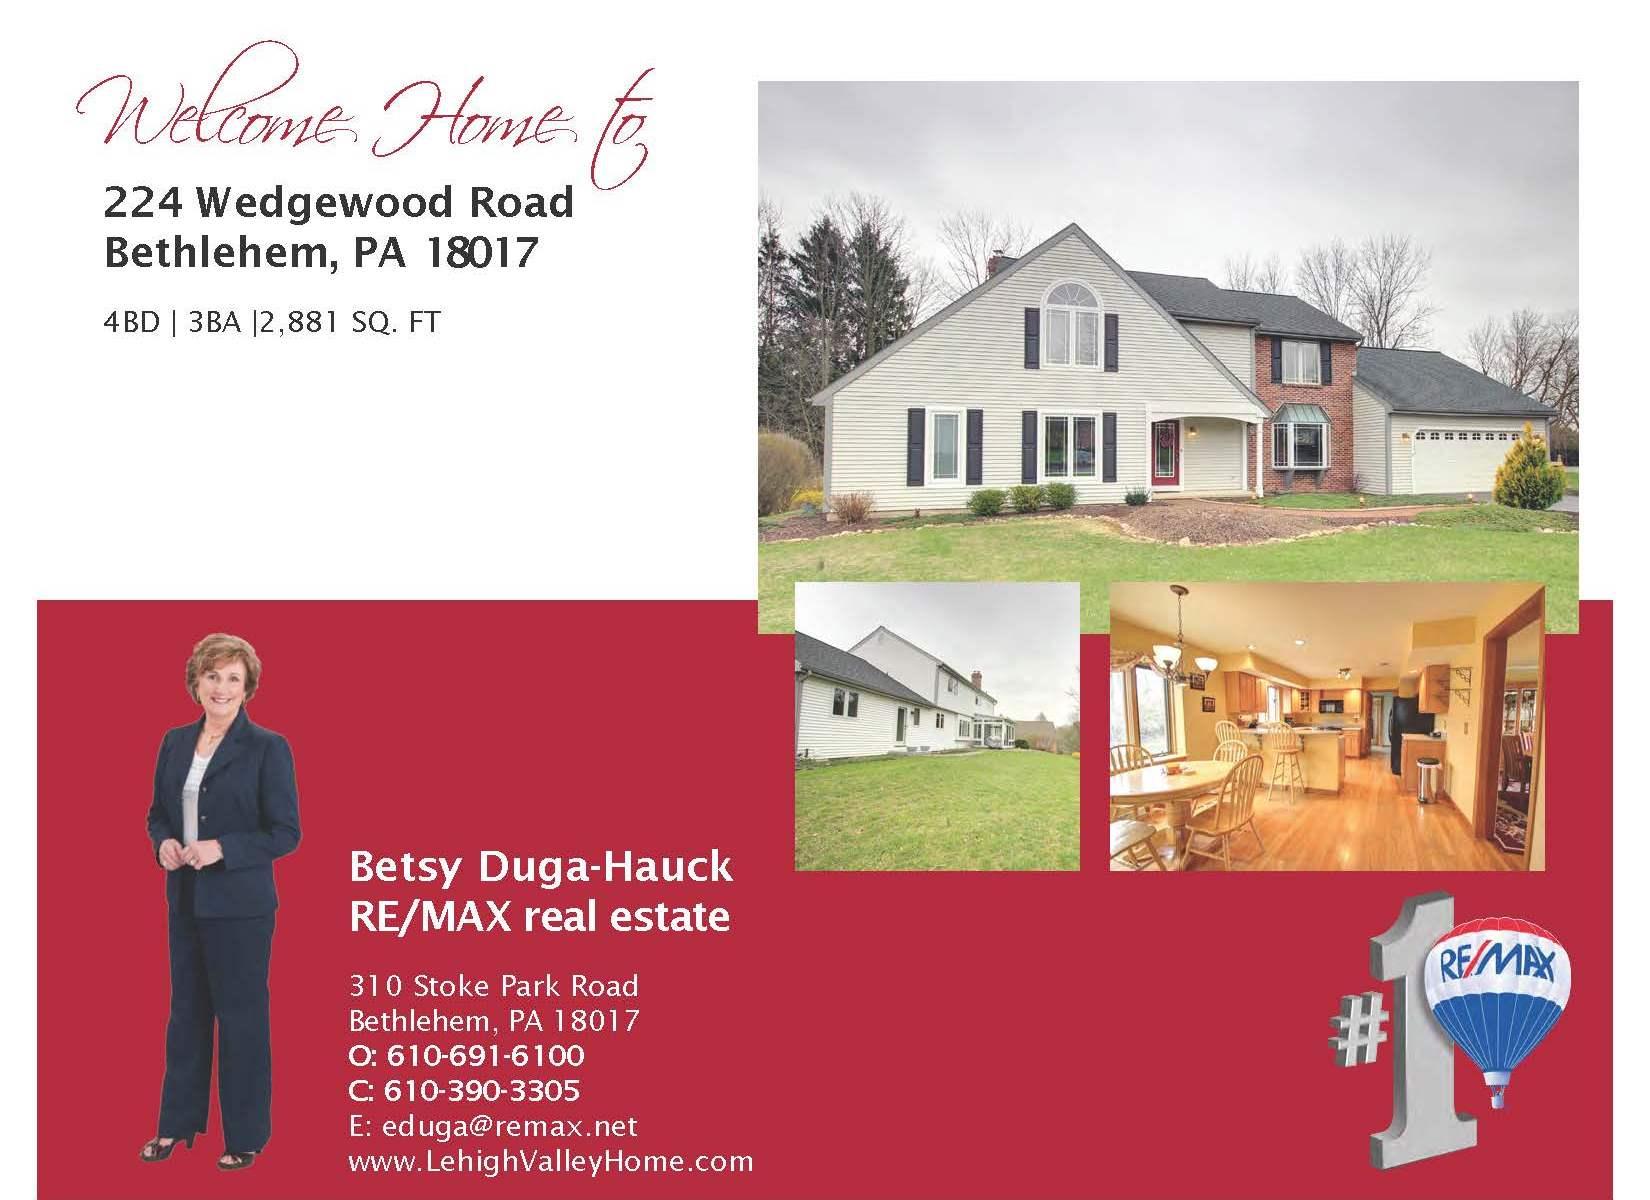 Listing Presentation – RE/MAX real estate Marketing